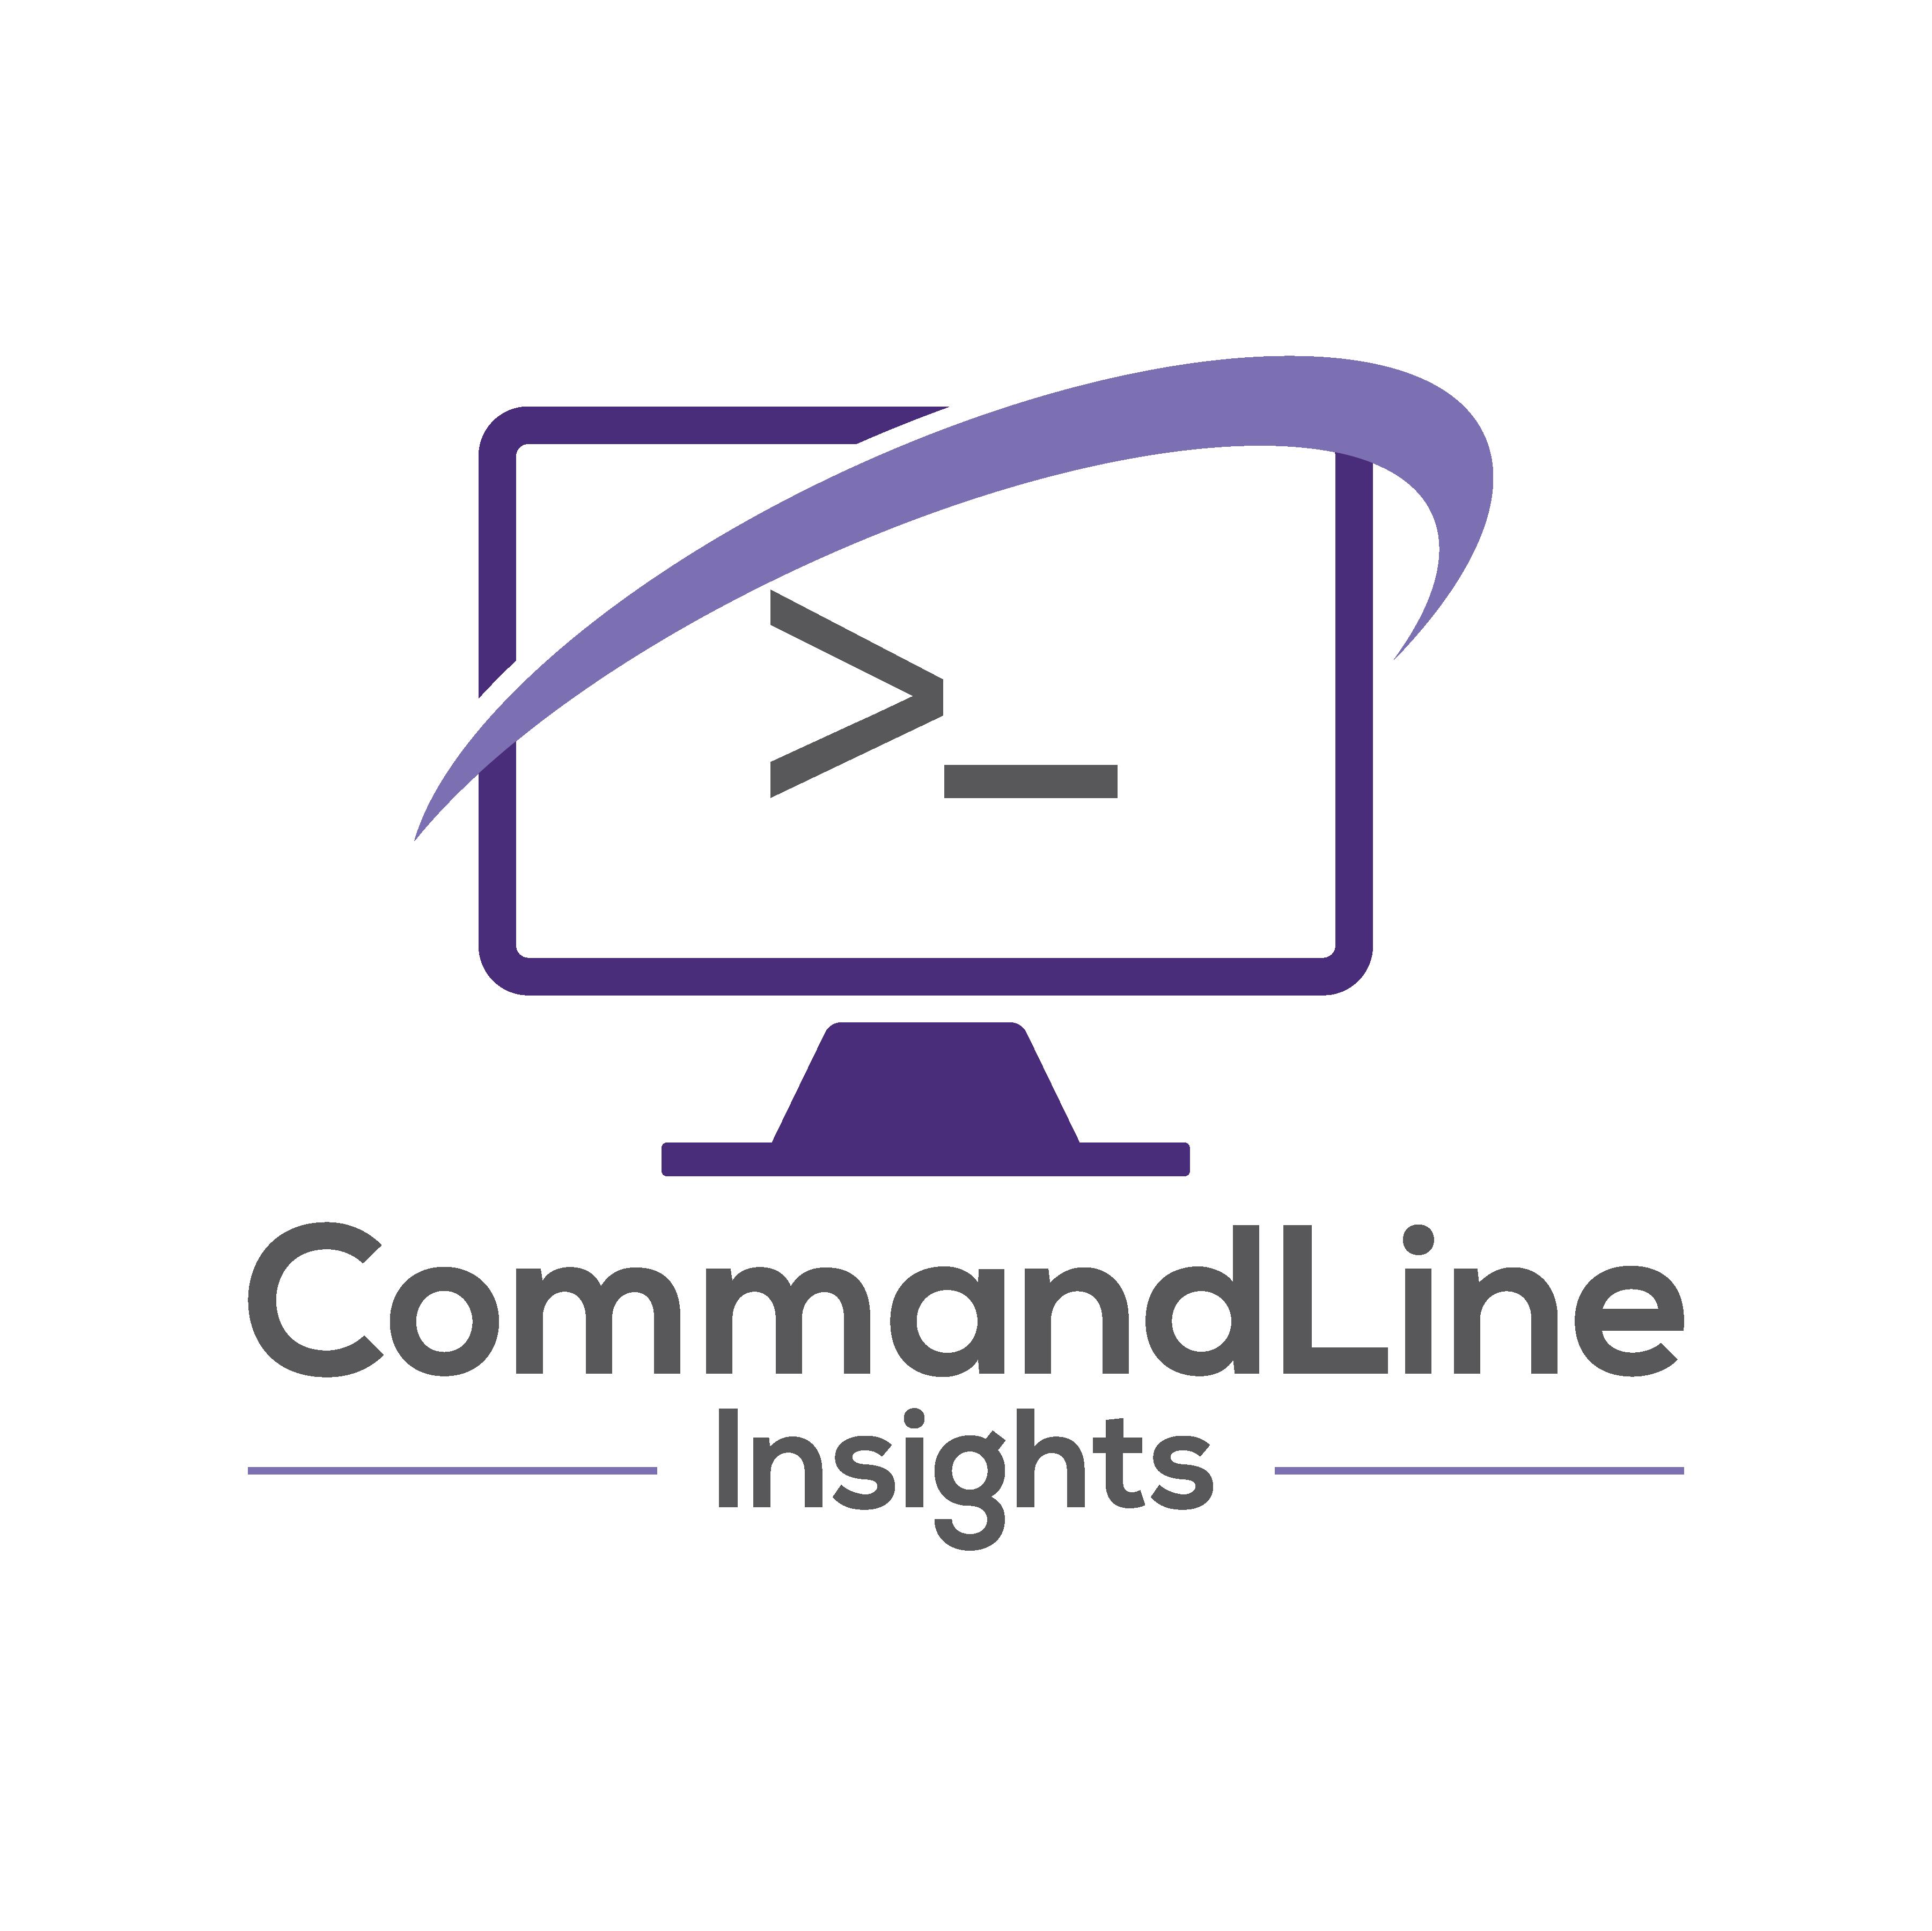 CommandLine Insights